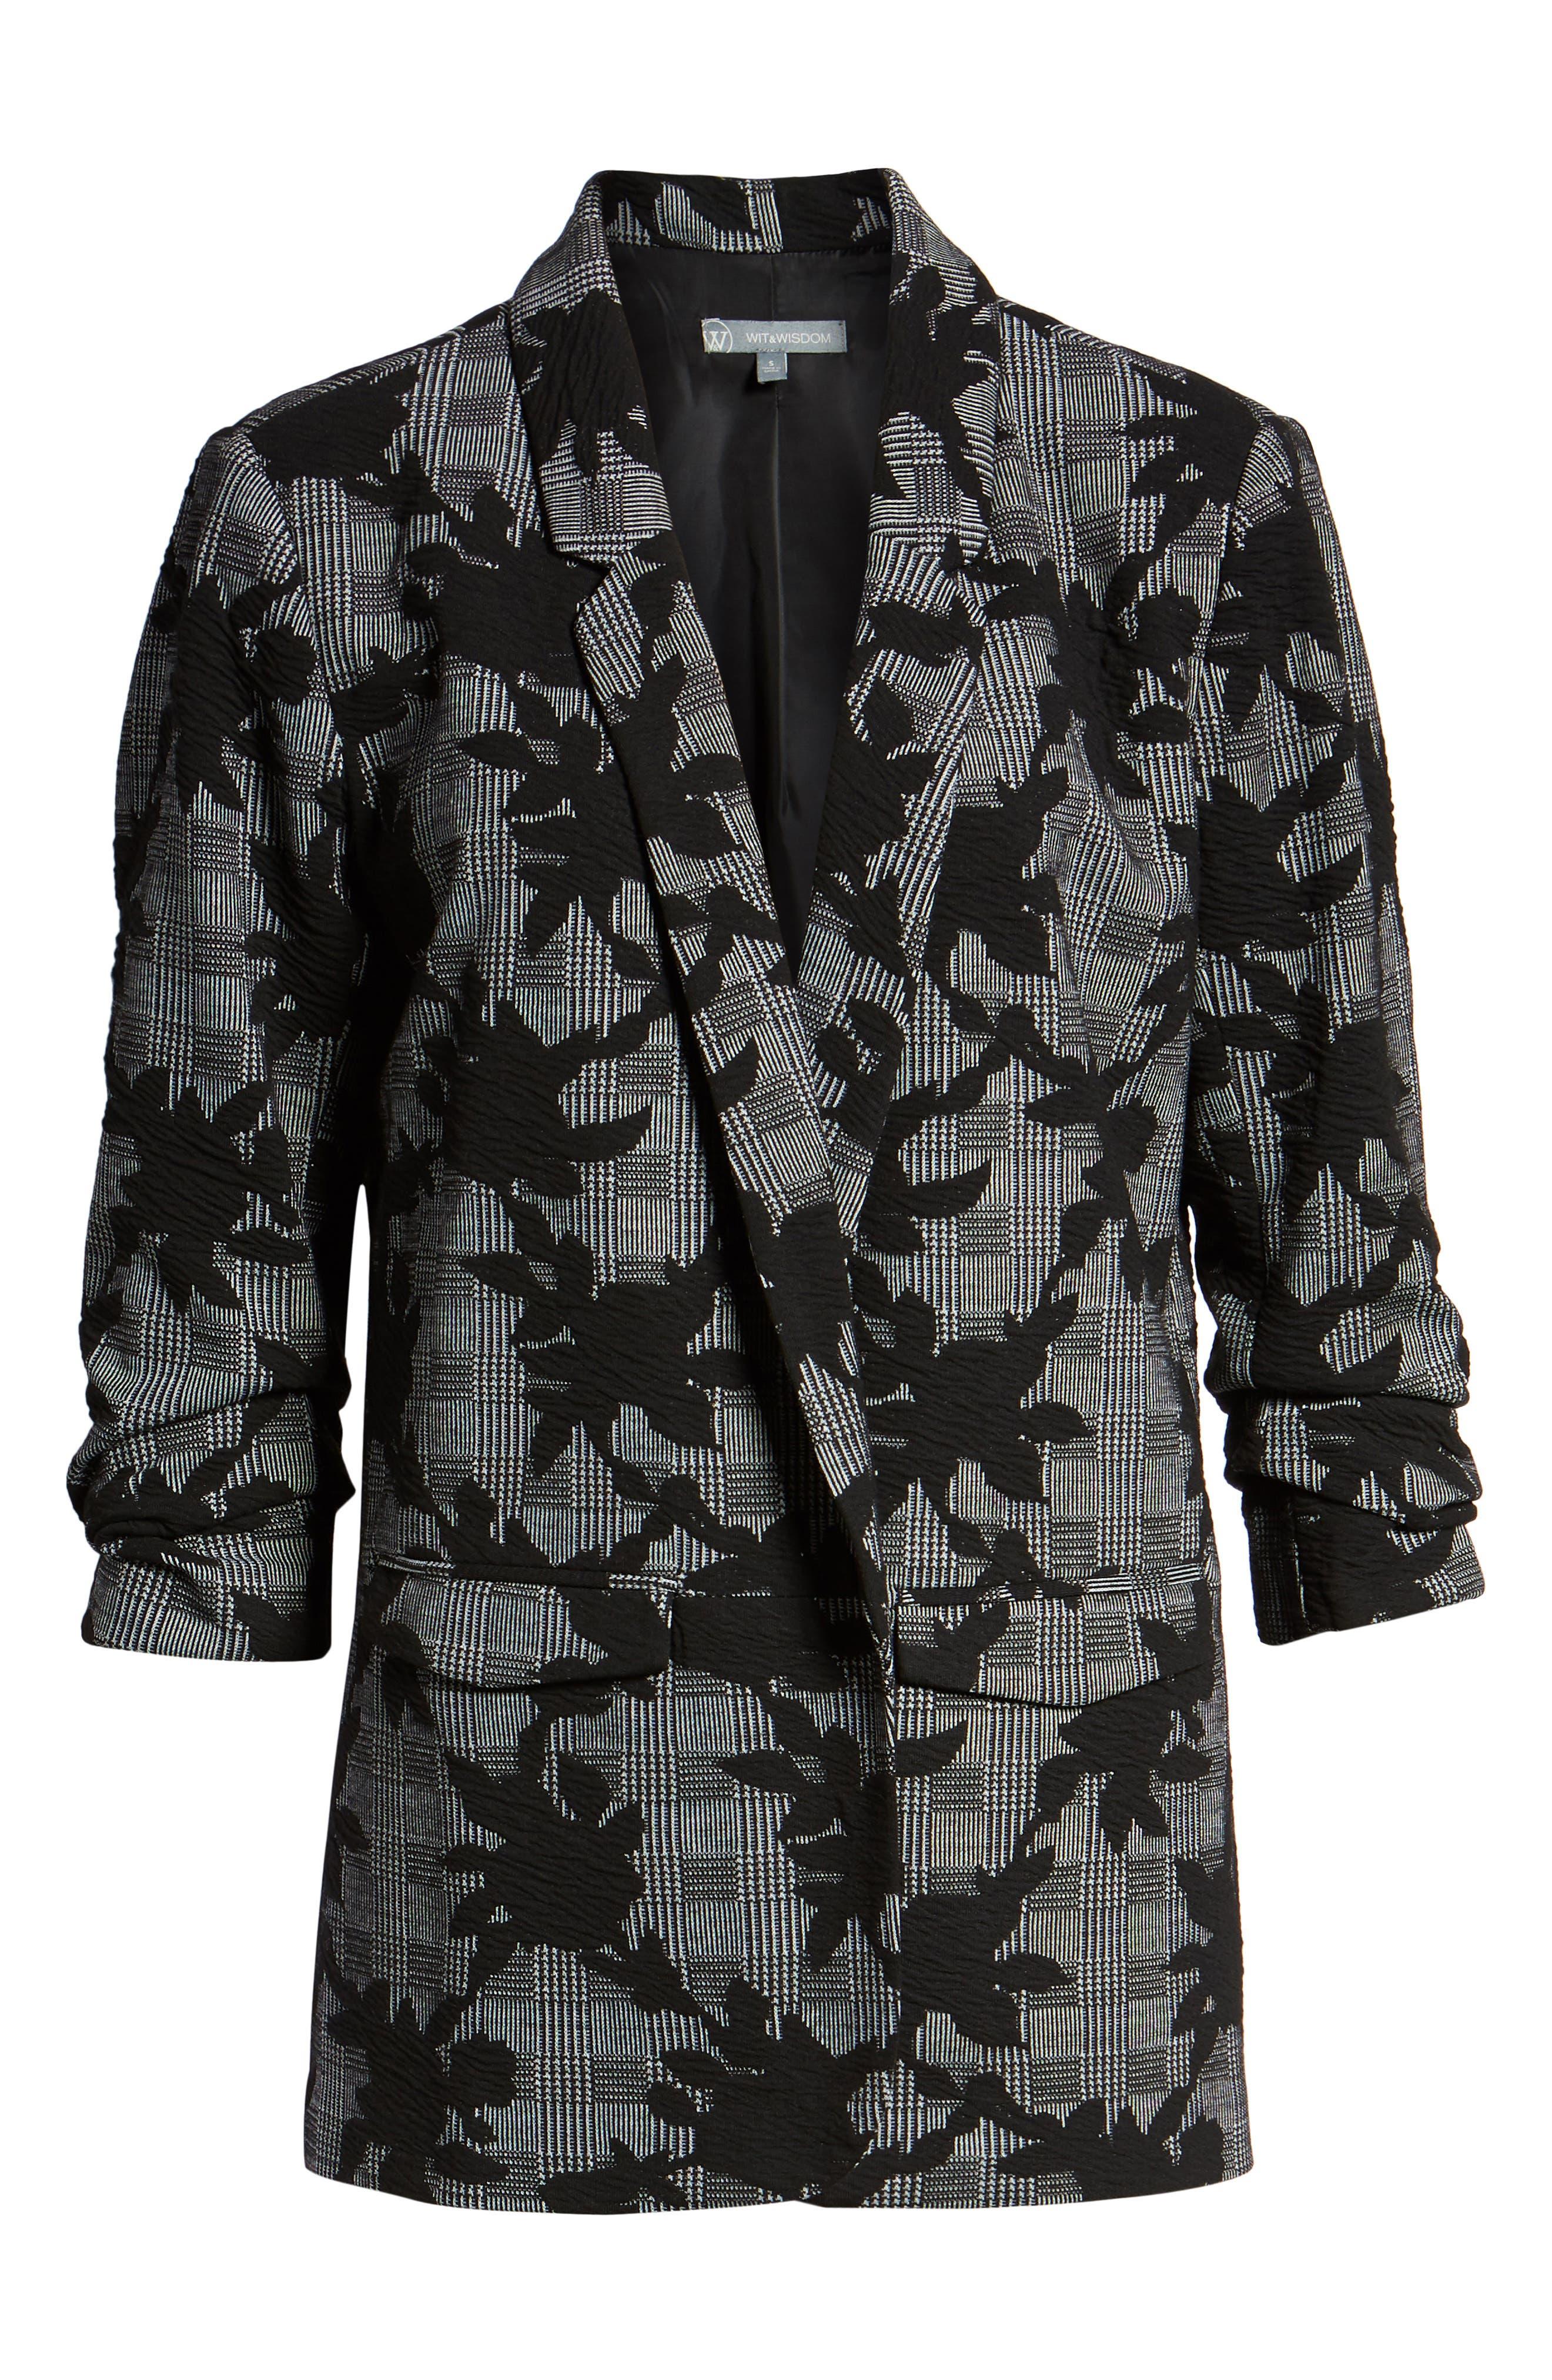 Floral Plaid Jacket,                             Alternate thumbnail 6, color,                             BLACK/ GREY